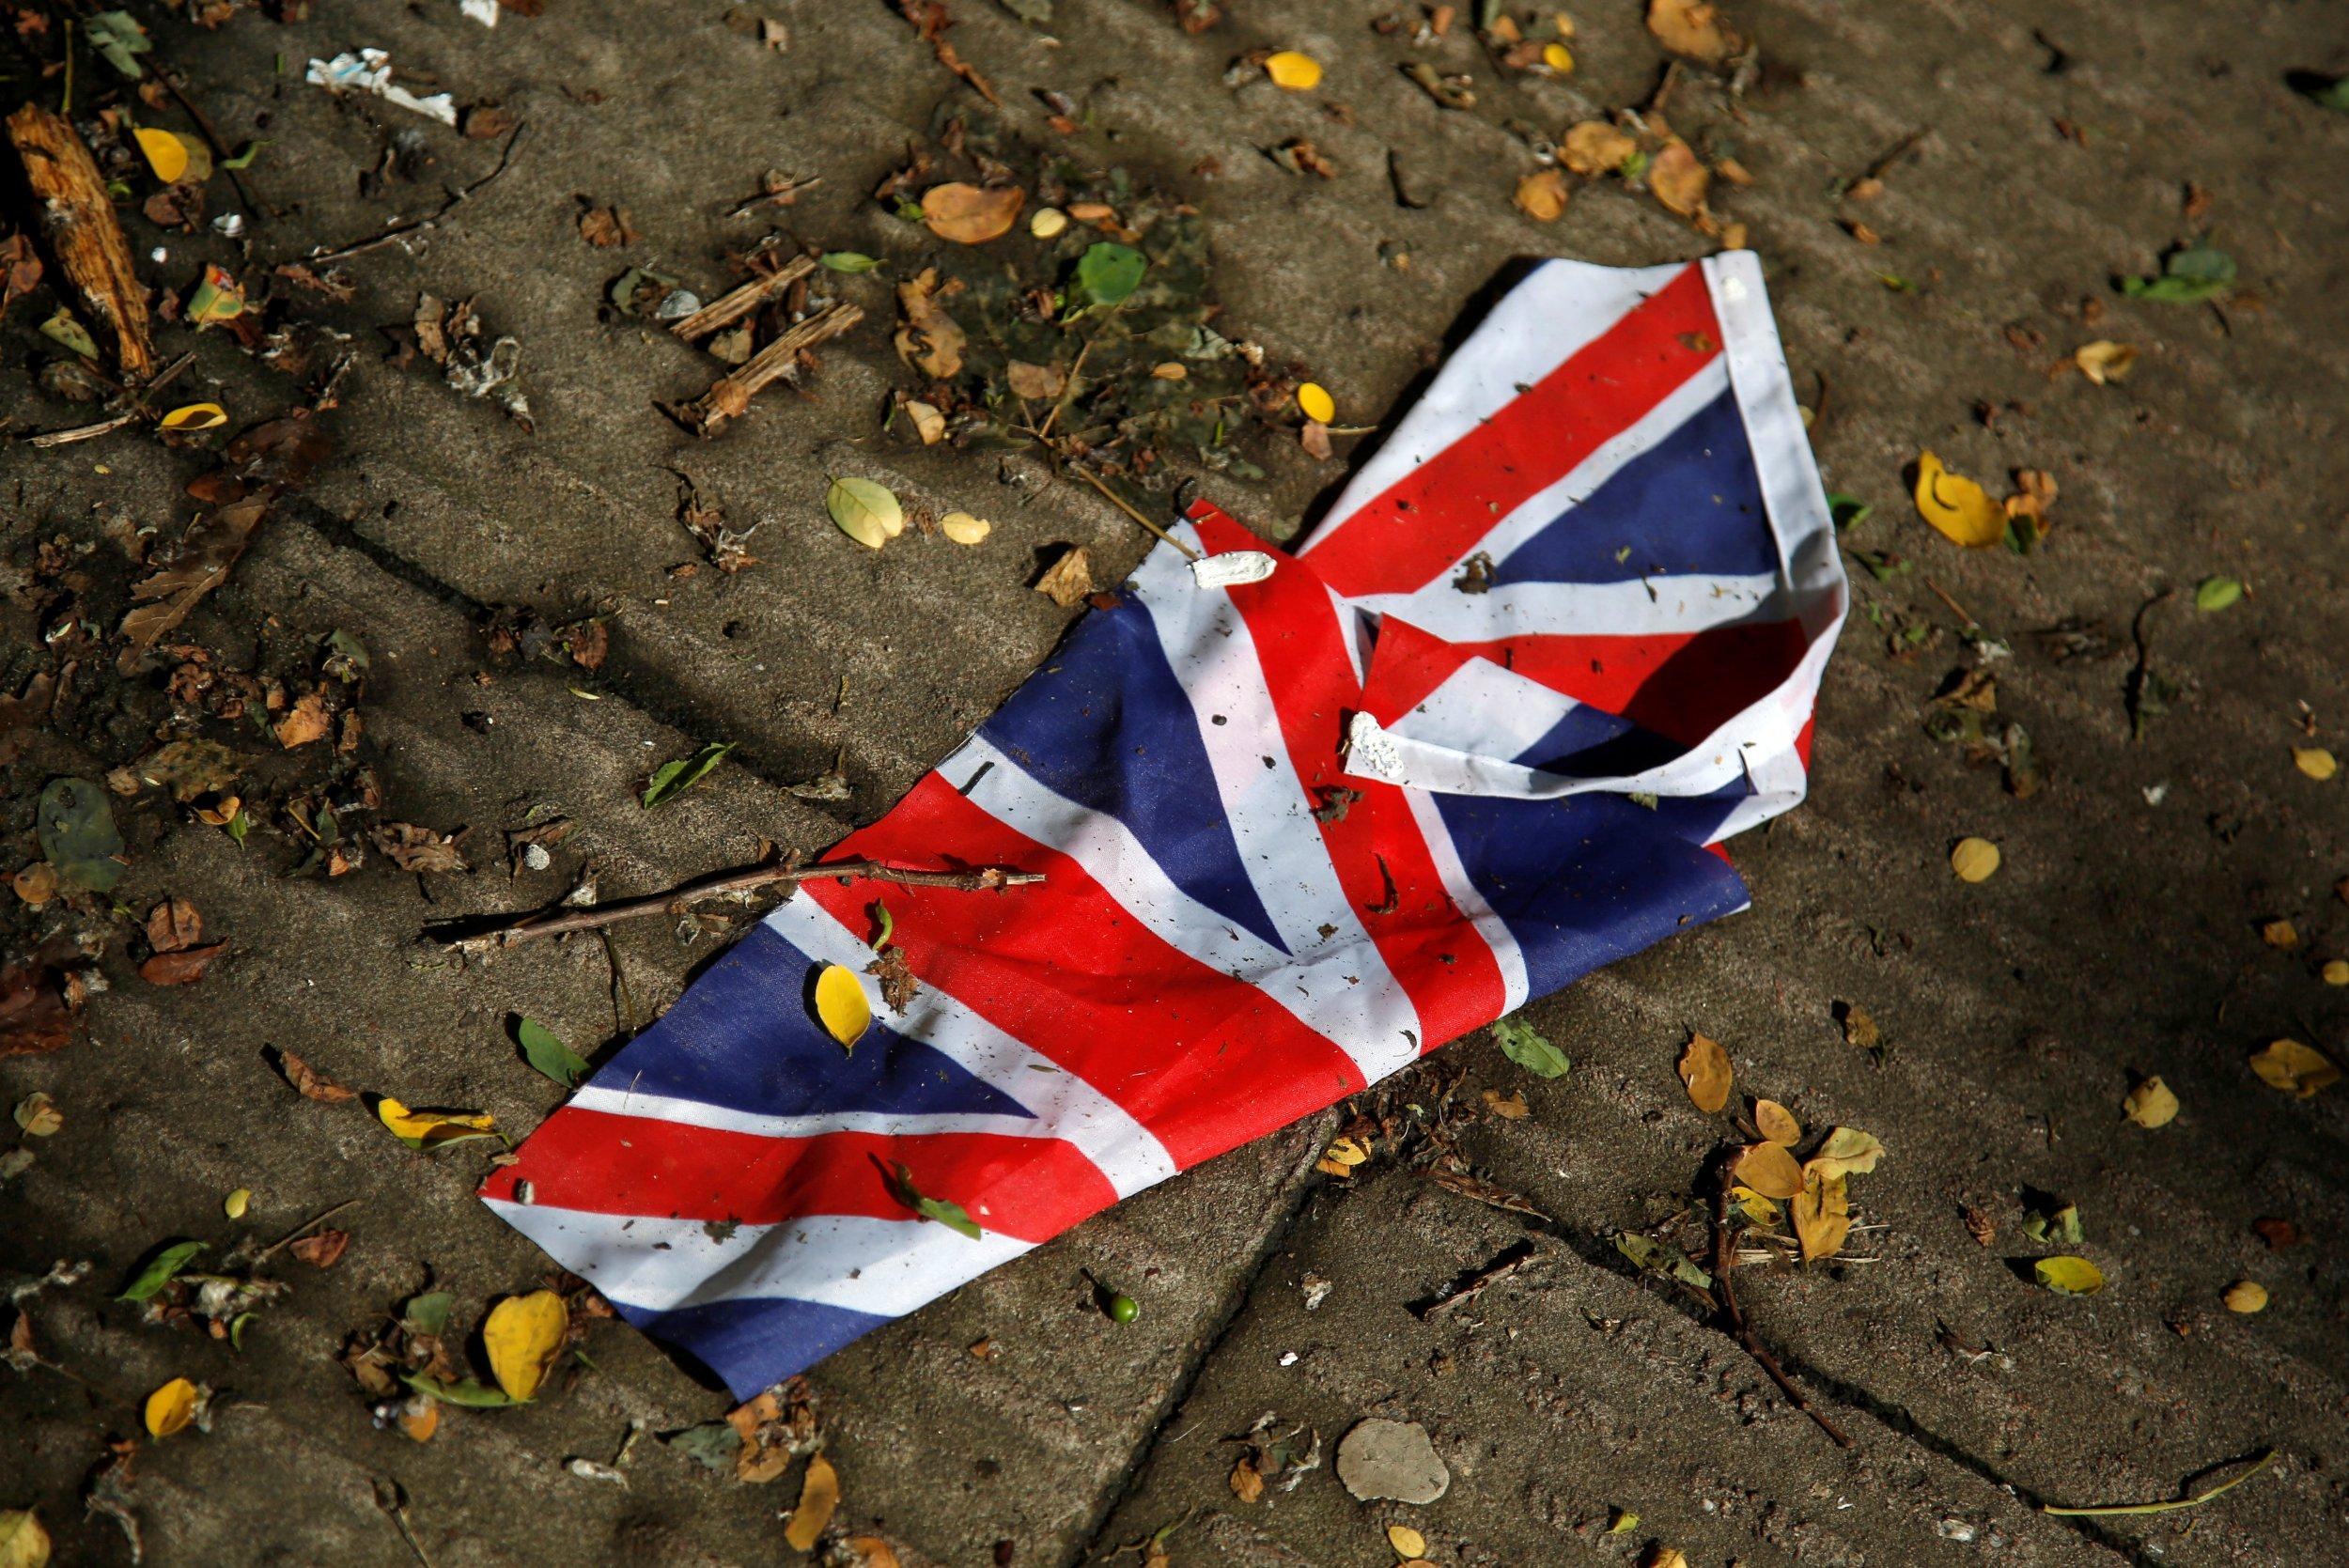 06_27_brexit_environment_01